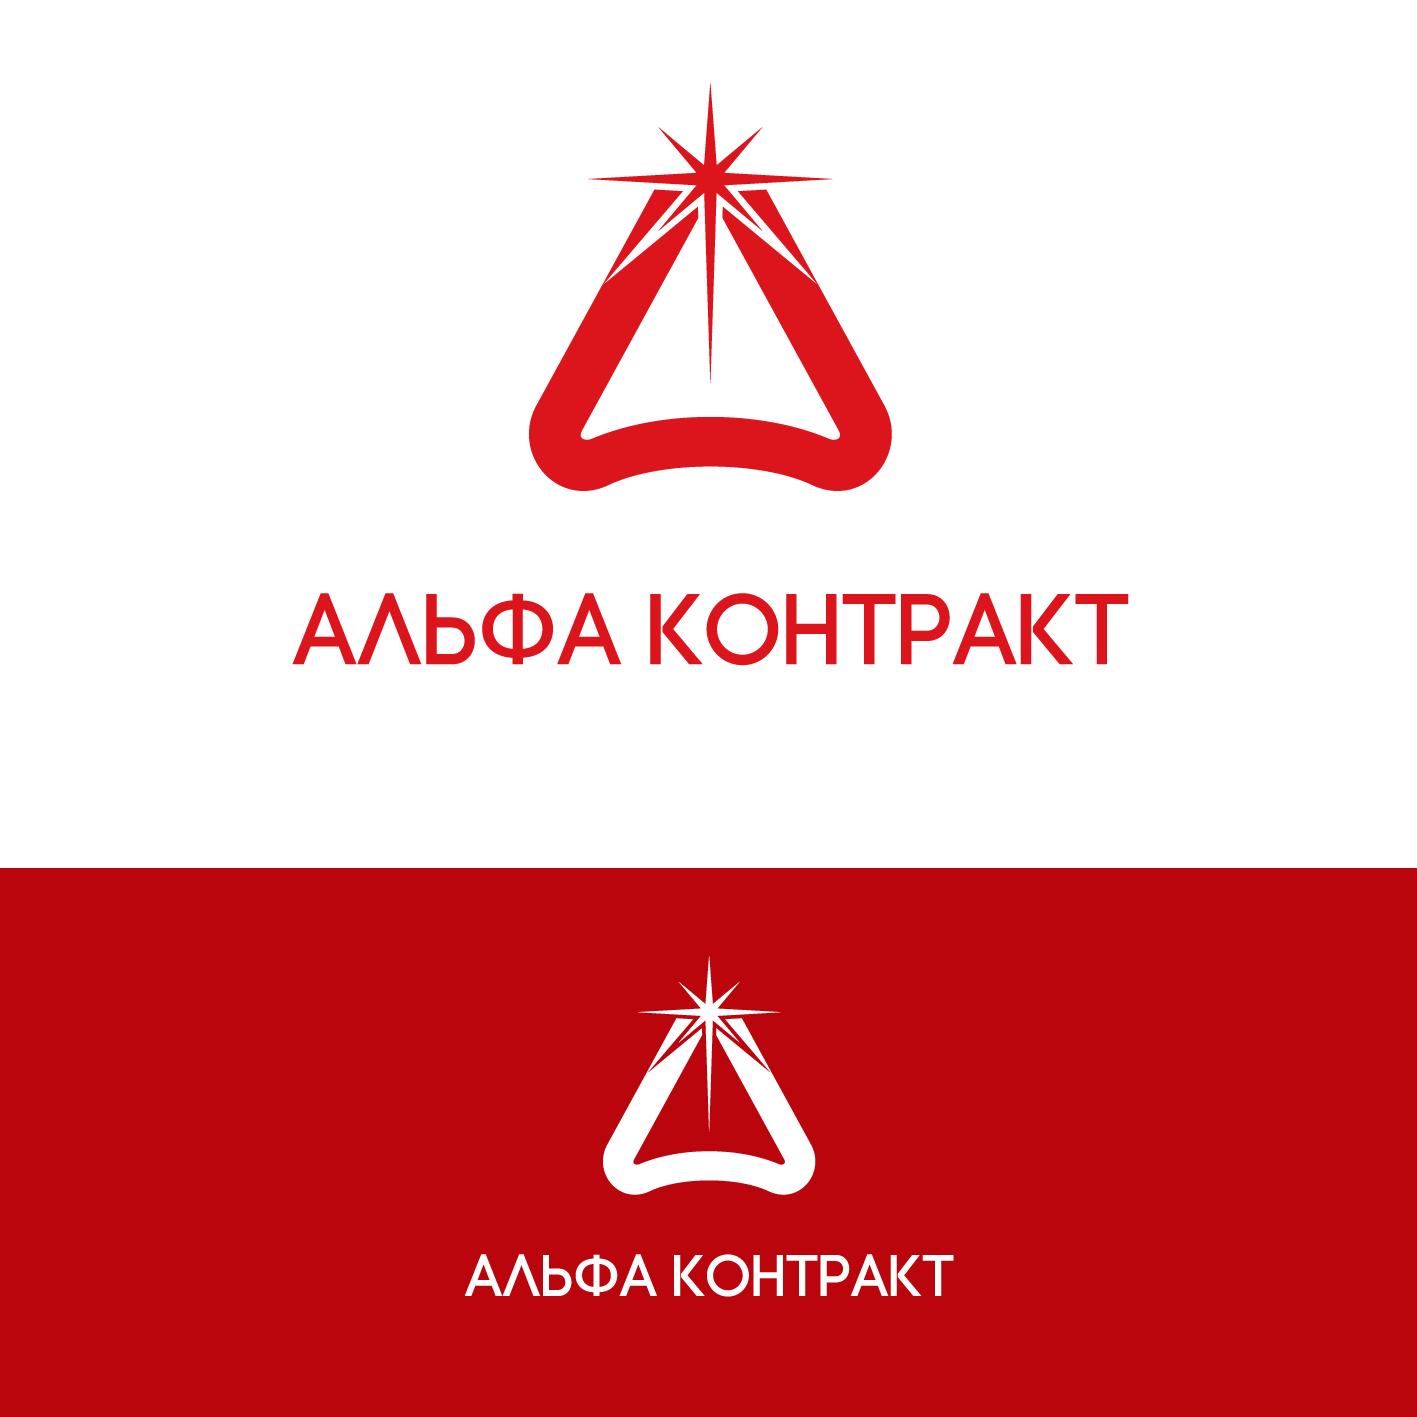 Дизайнер для разработки логотипа компании фото f_0315bf6e314a7010.png